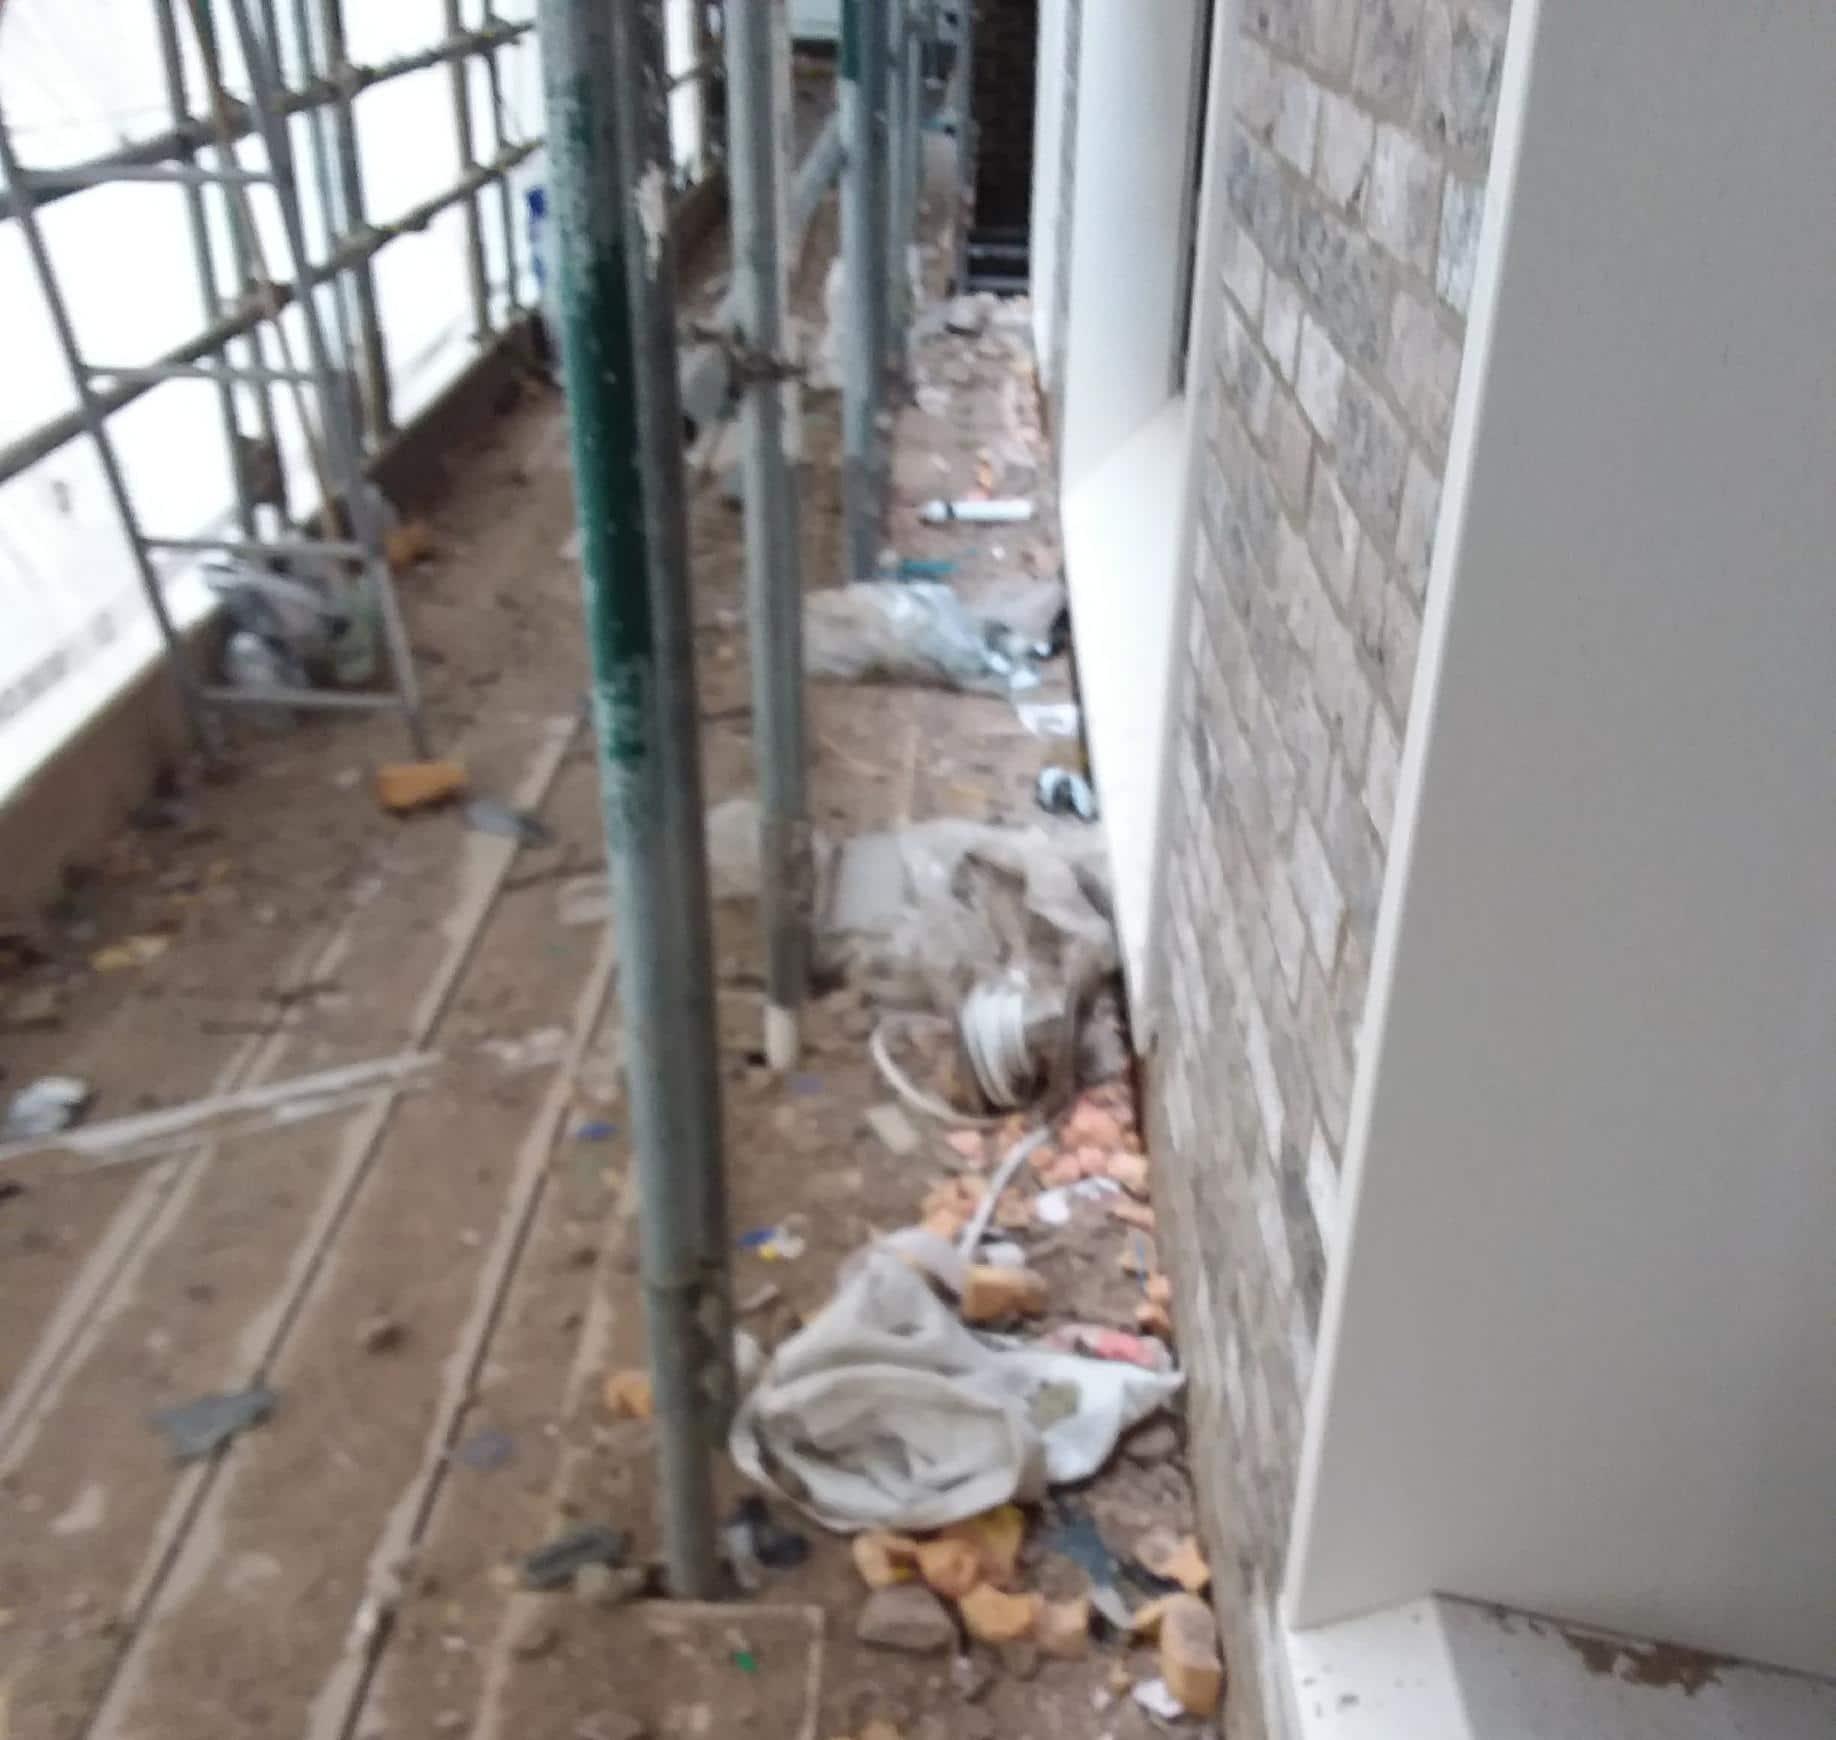 Debris on scaffolding